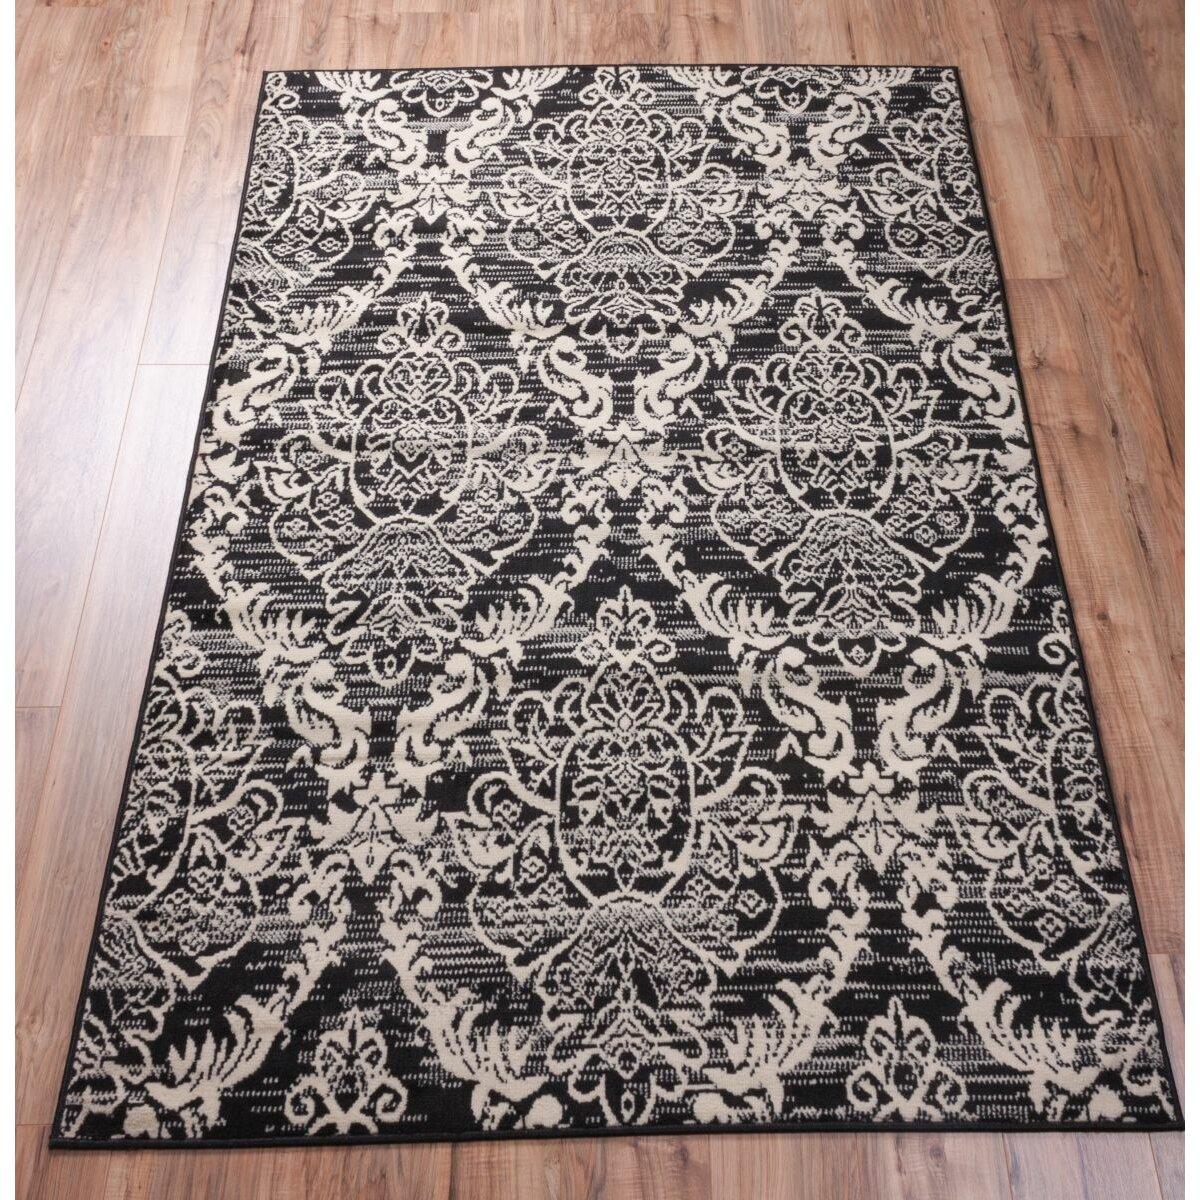 house of hampton aldenport sunshine circles black white area rug reviews wayfair. Black Bedroom Furniture Sets. Home Design Ideas